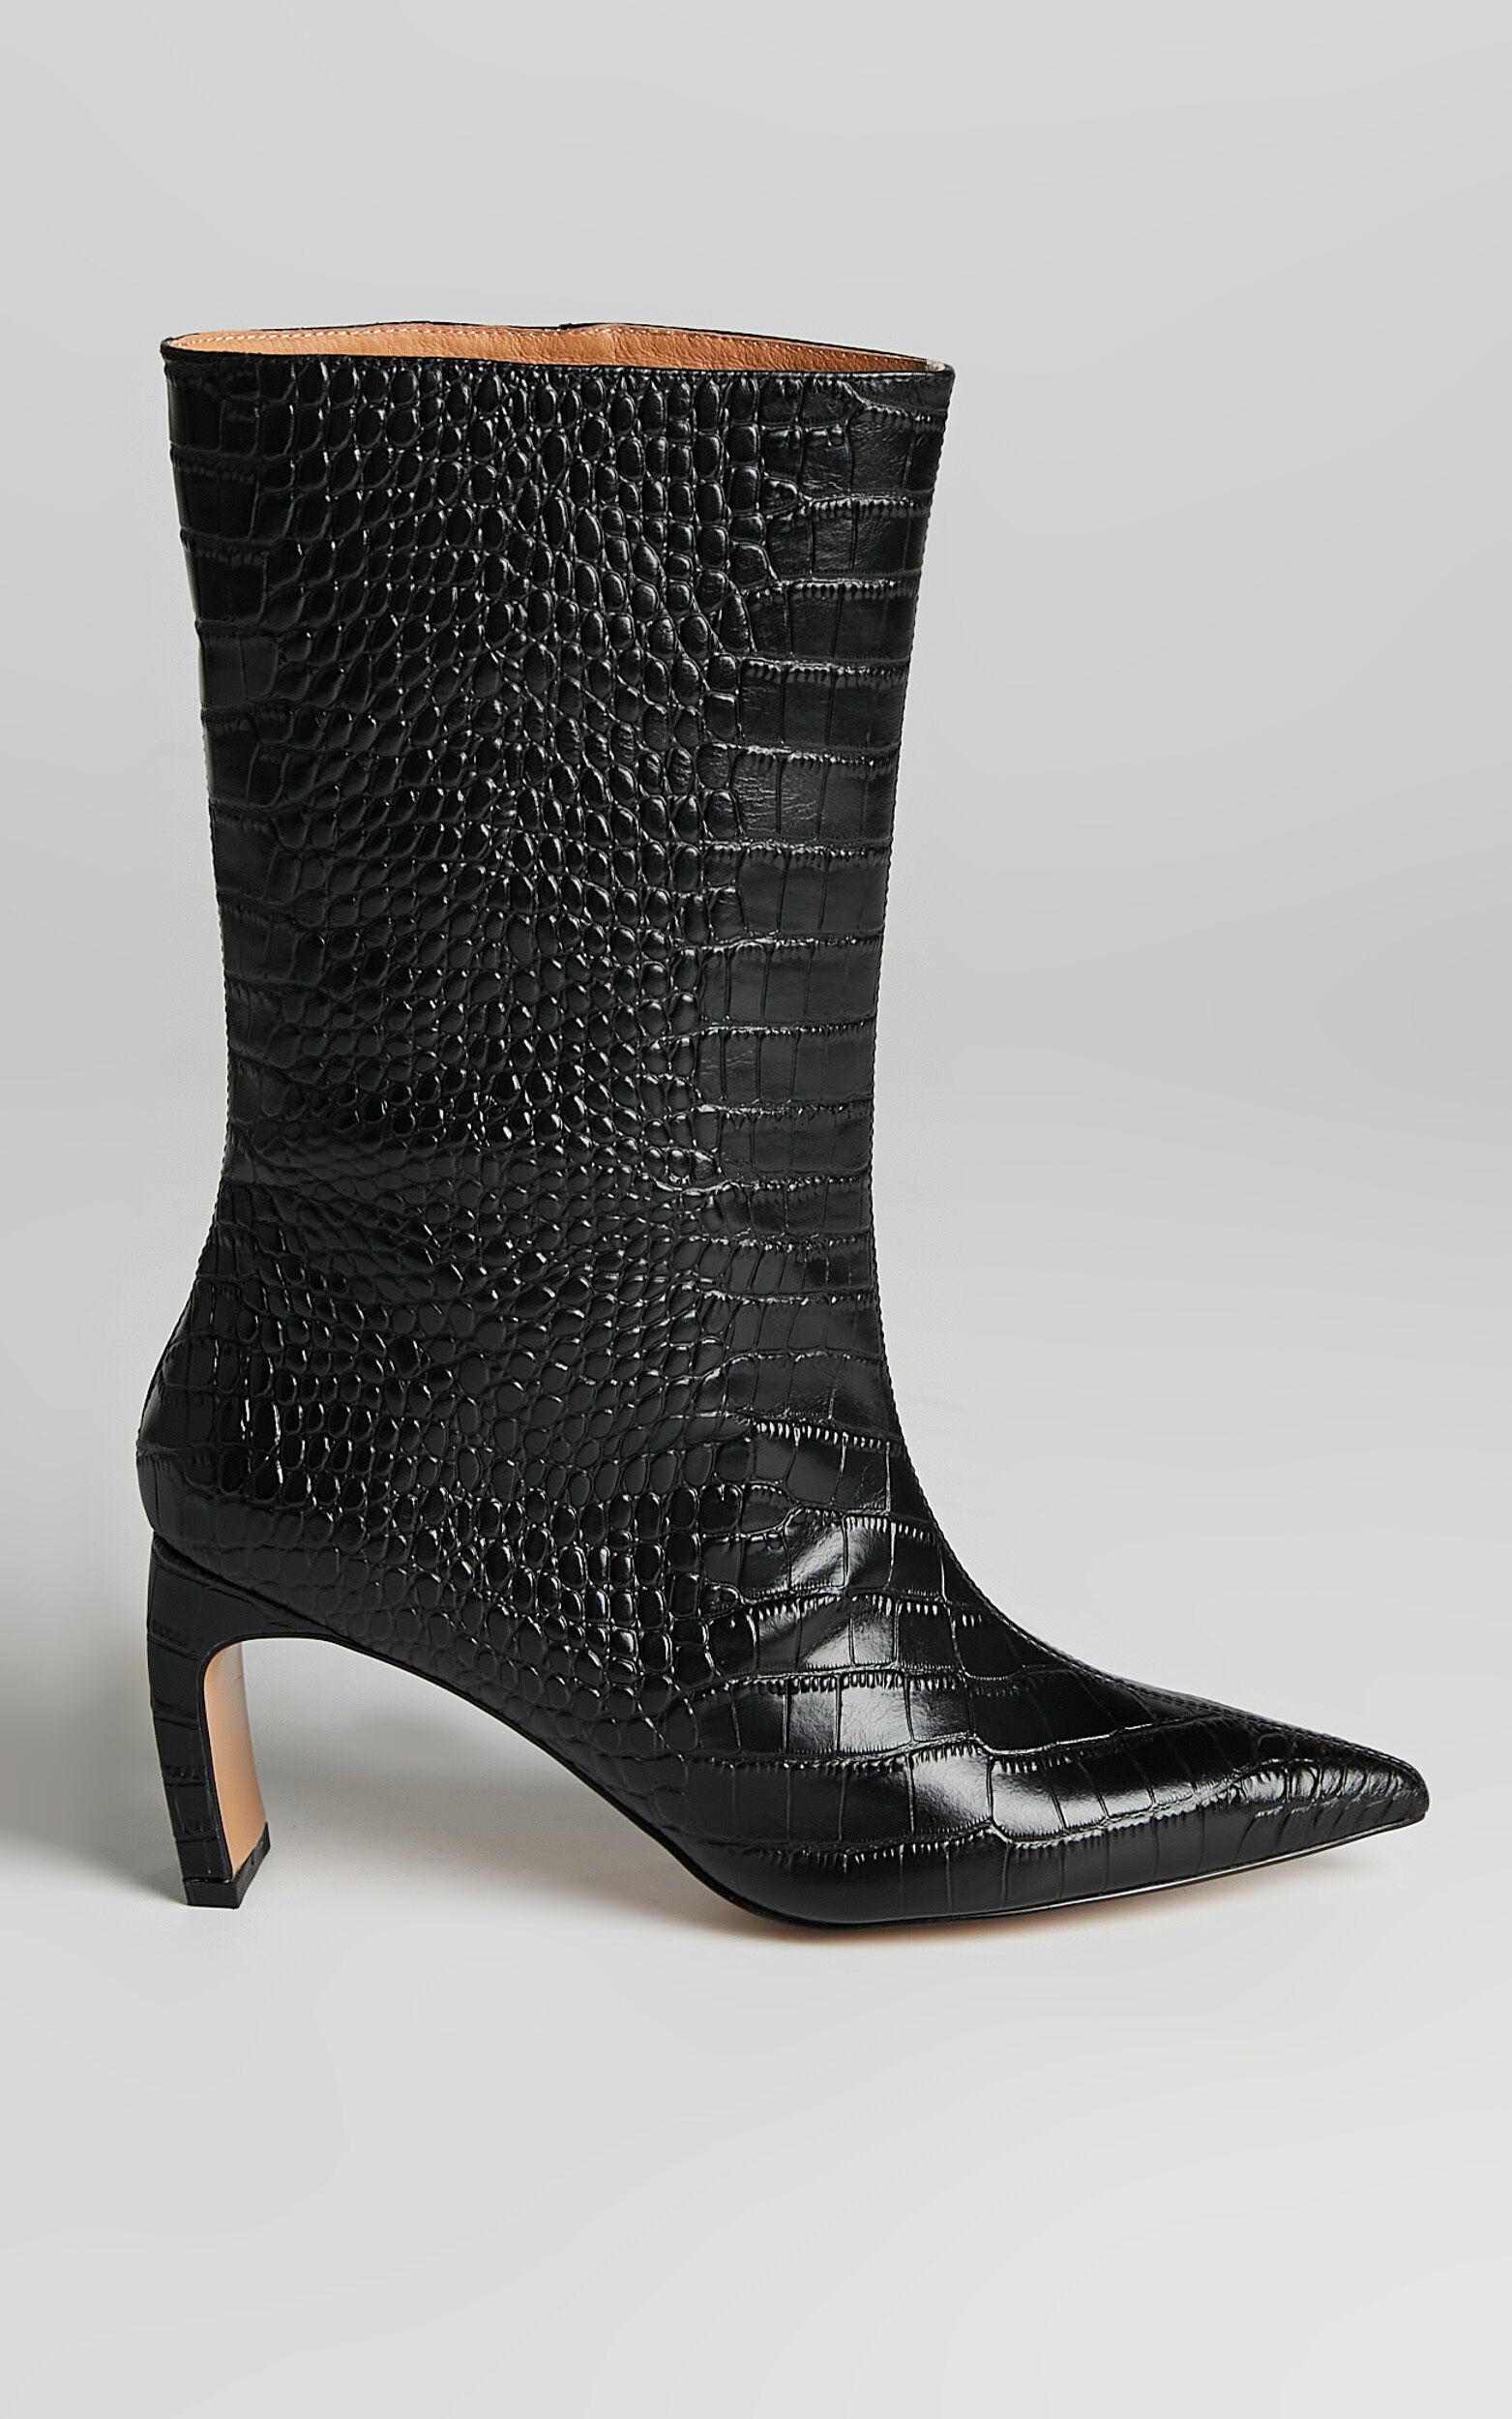 Alias Mae - Jax Boots in Black Croc - 10.5, BLK1, super-hi-res image number null